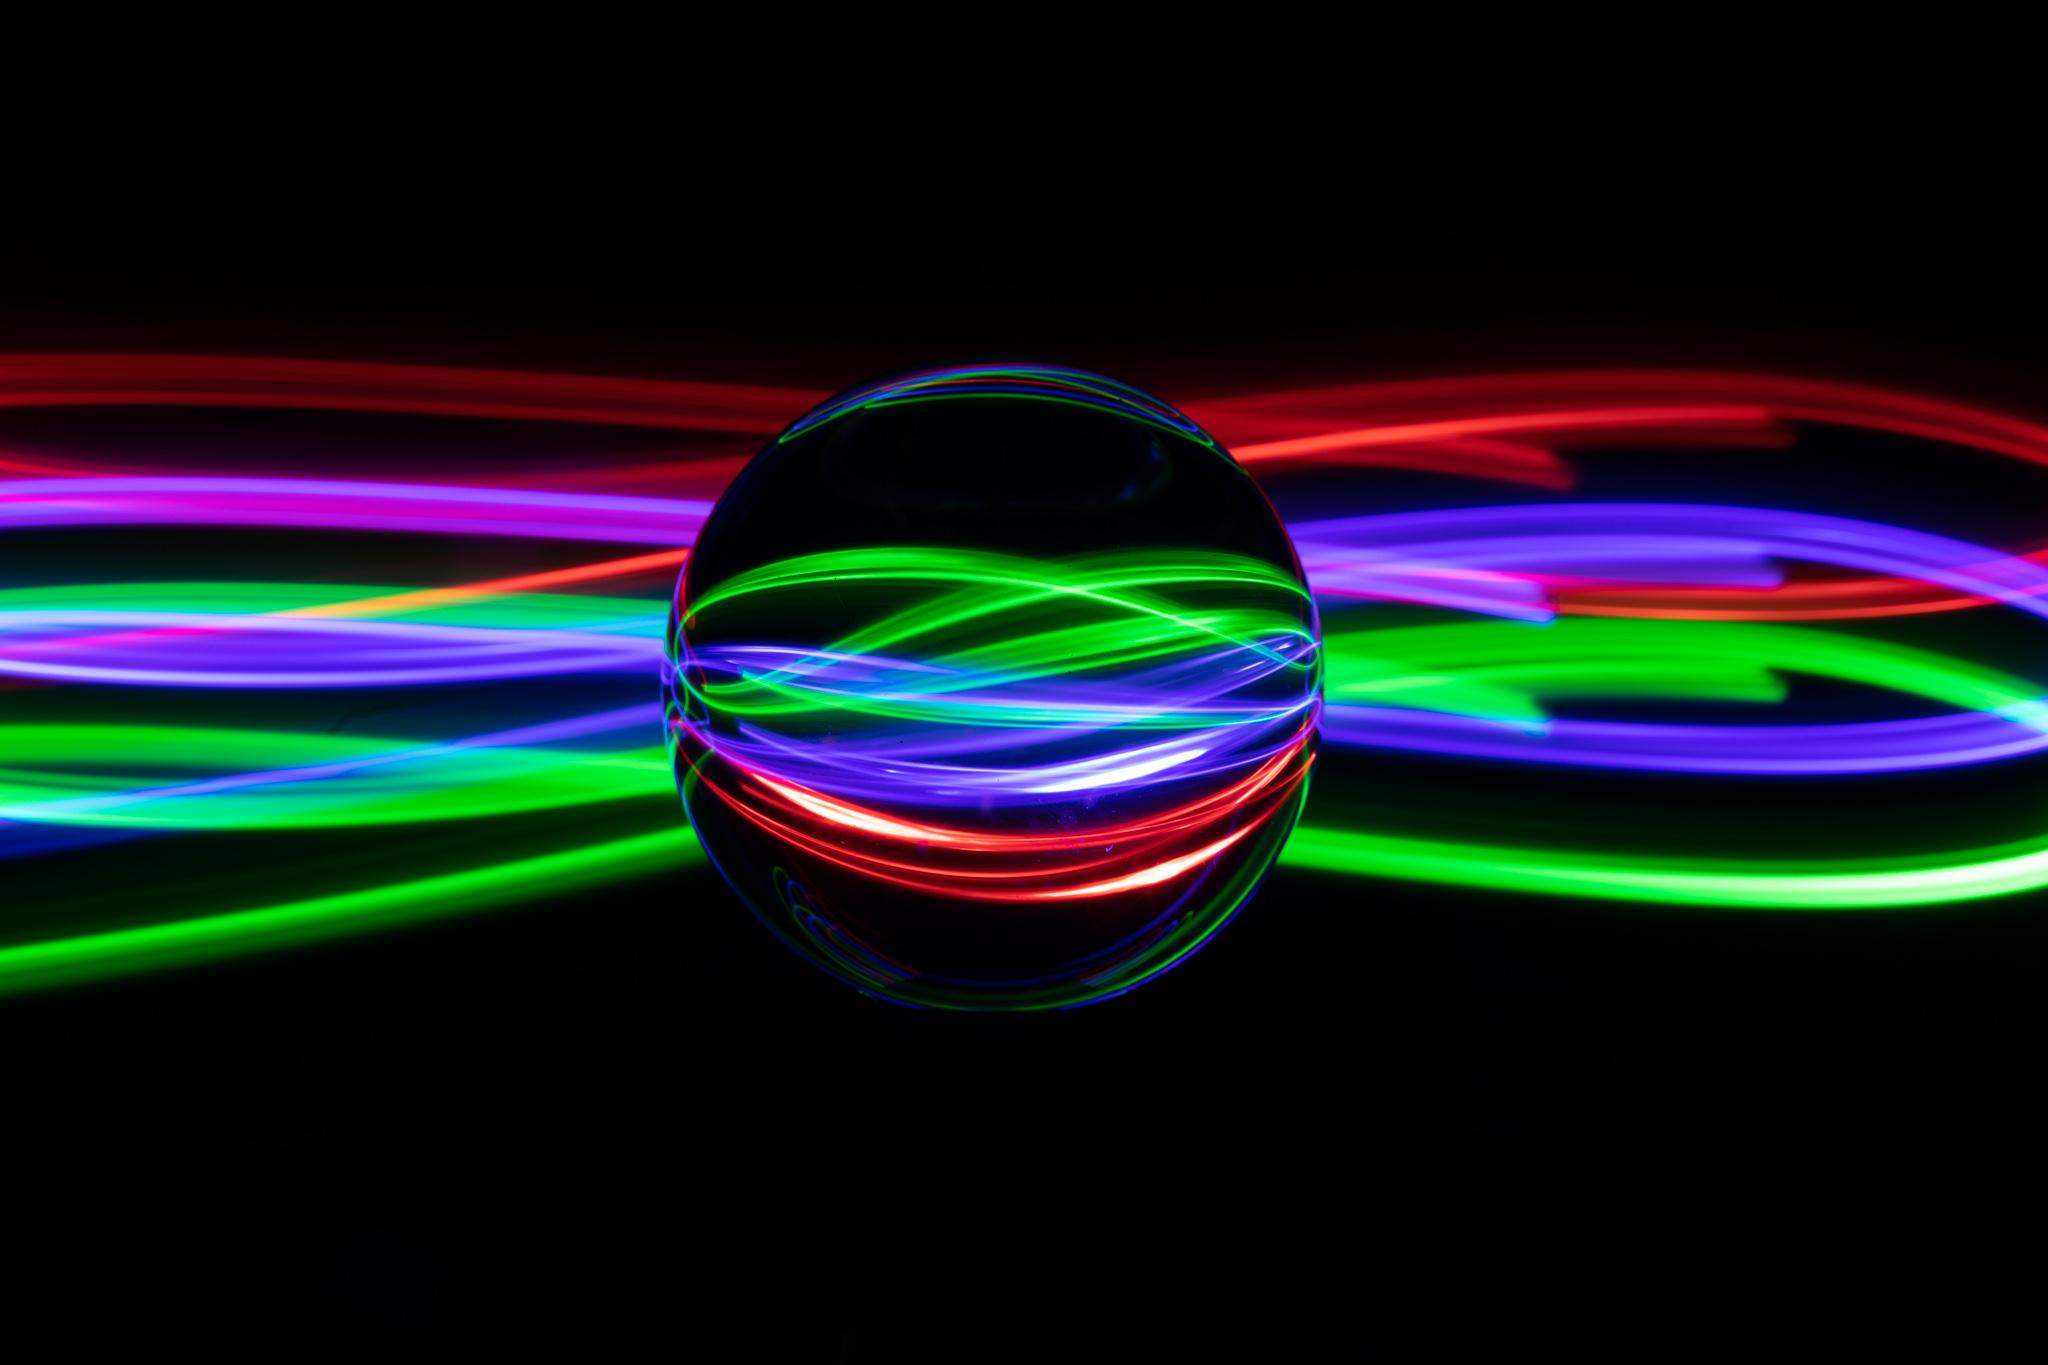 Whirling Dervish - Donna Marshall